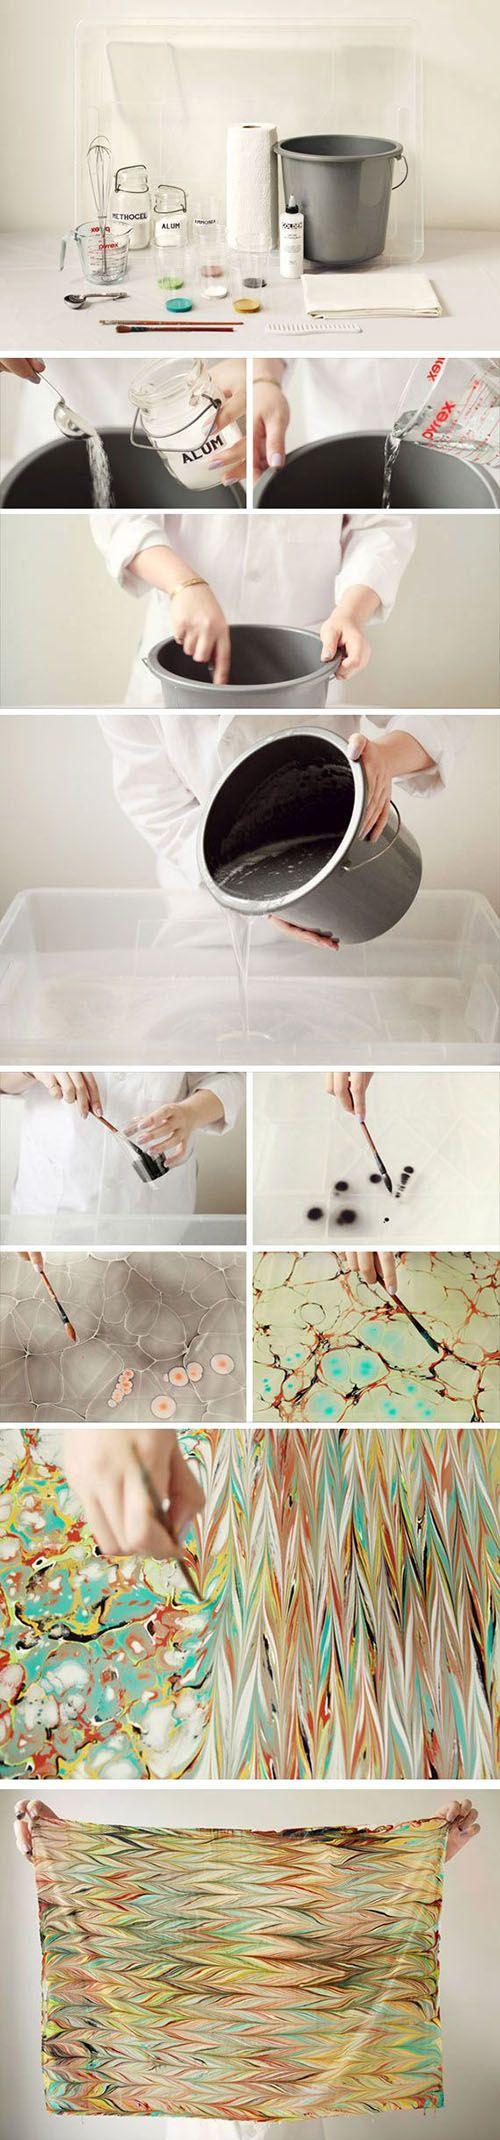 Make Your Own Marbled Scarf   DIY & Crafts Tutorials